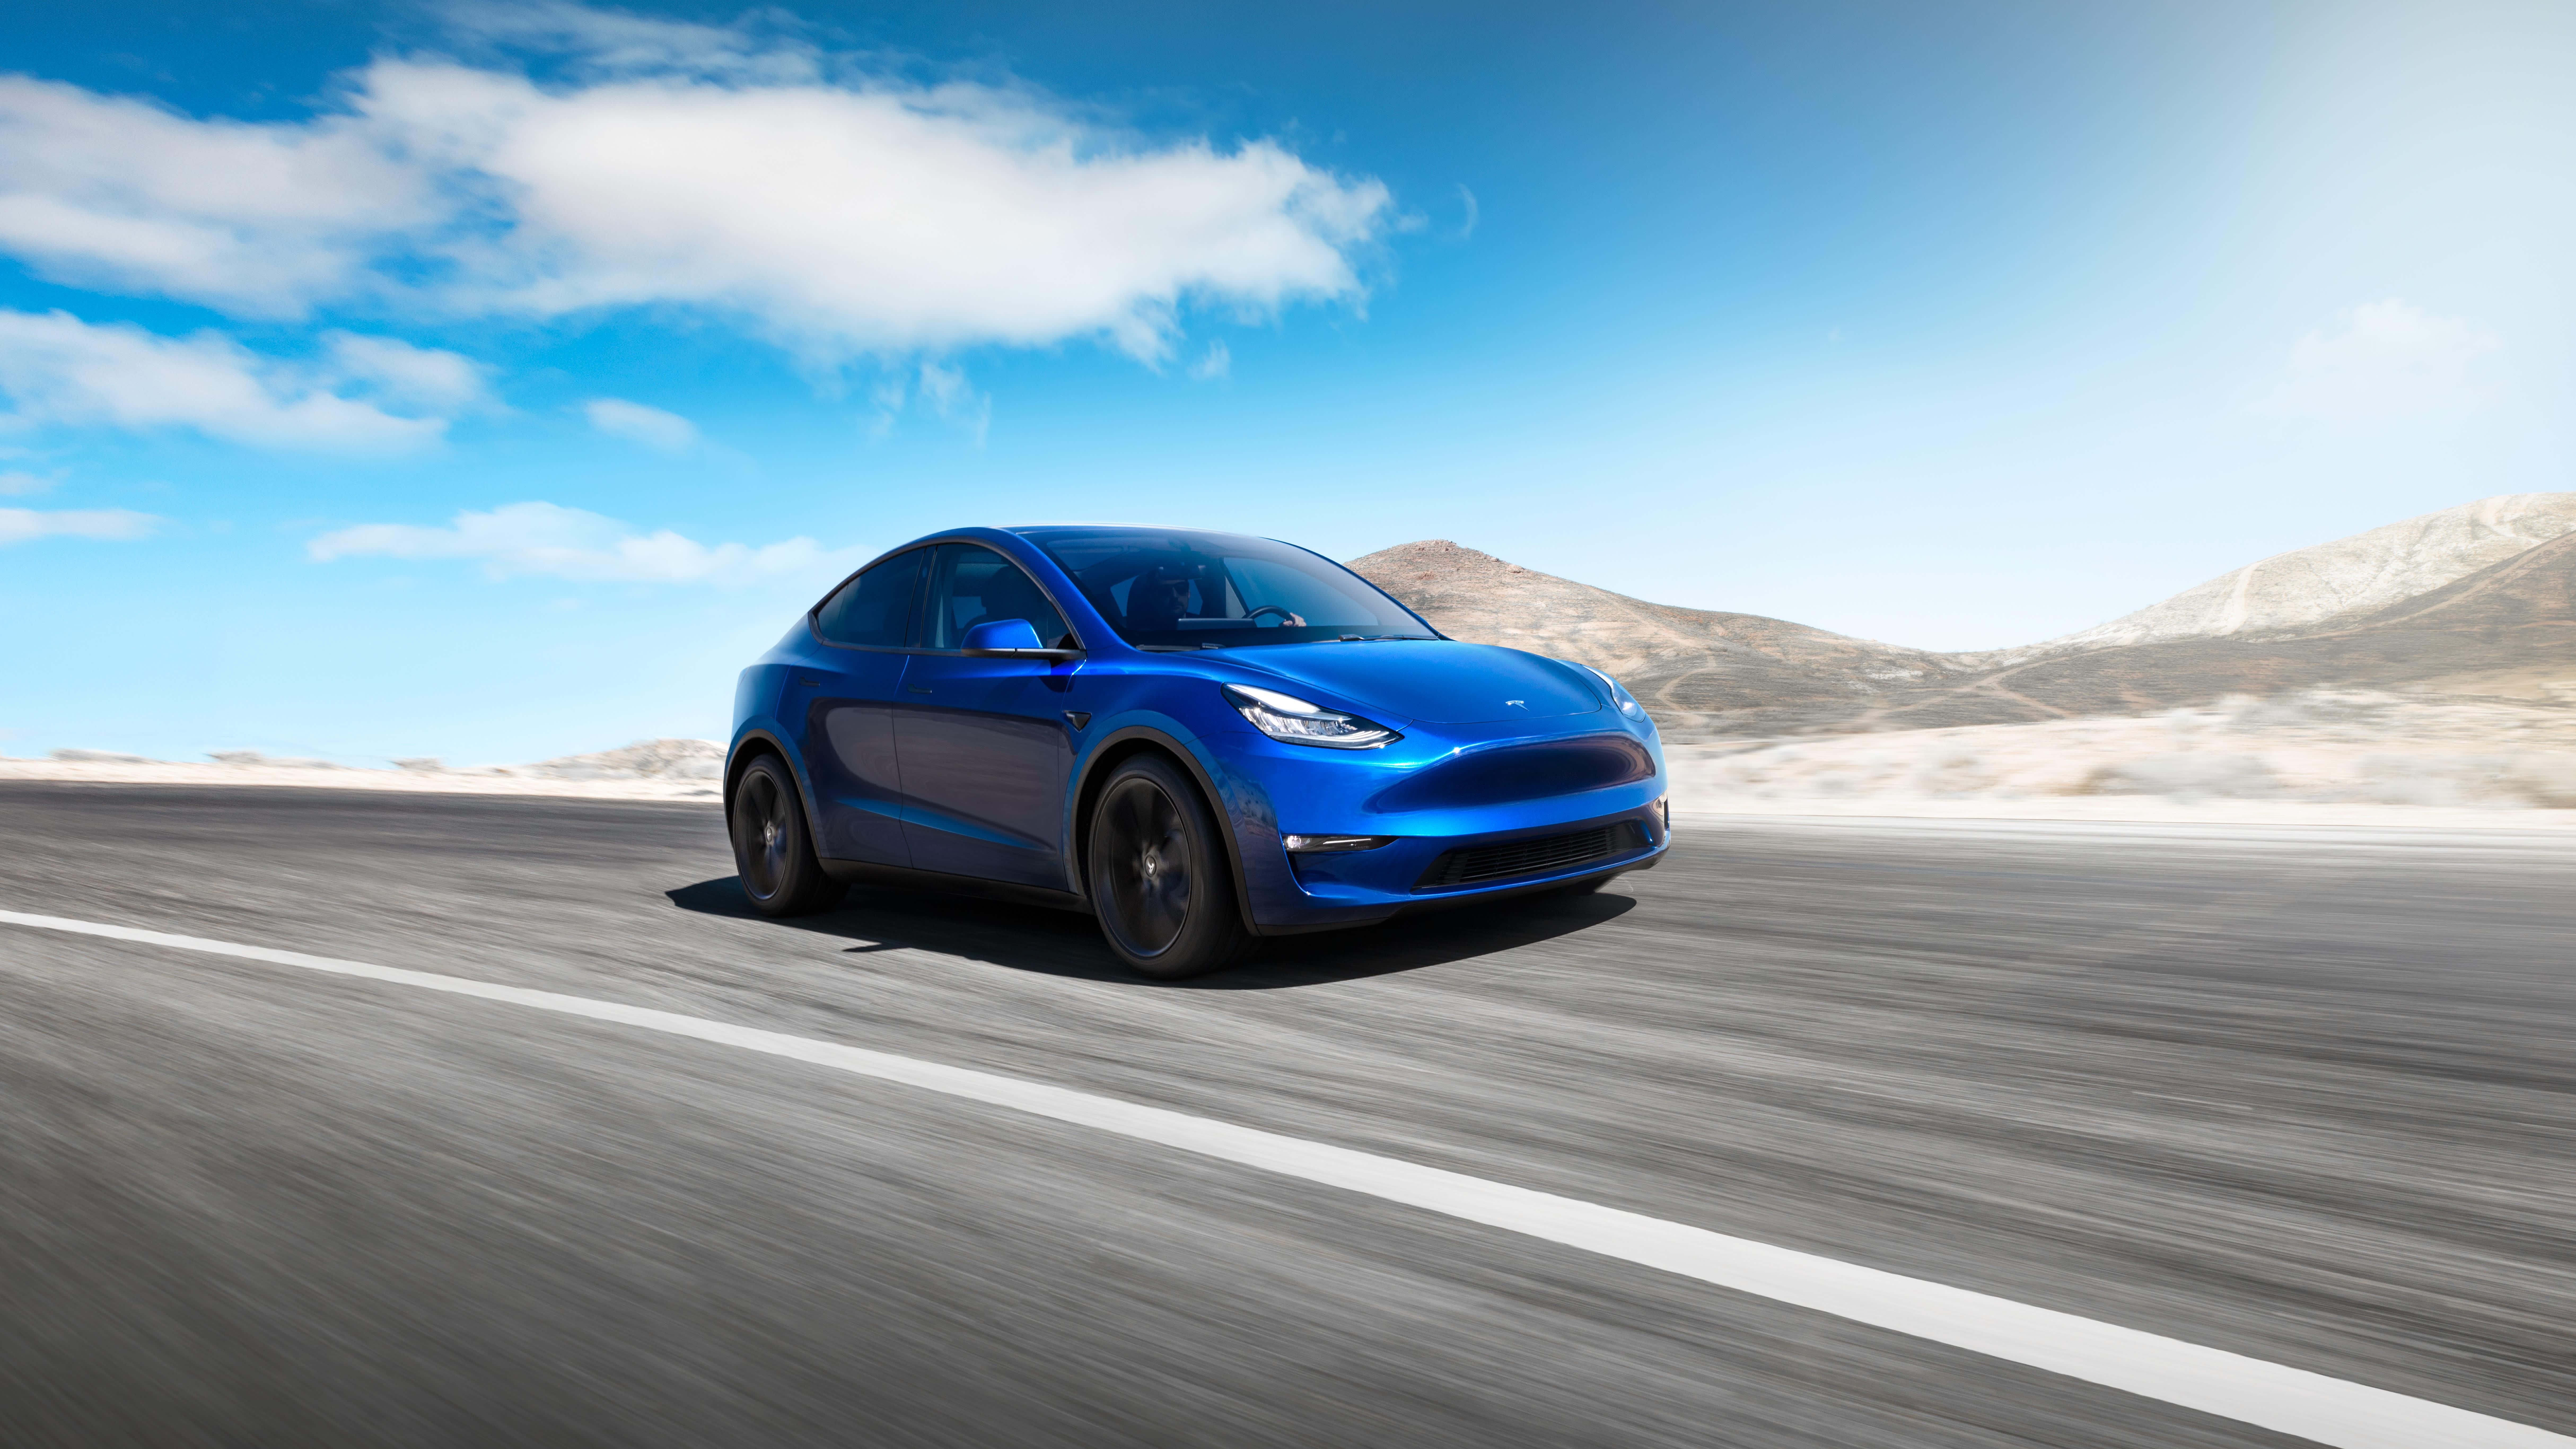 Tesla unveils Model Y: Price, release date